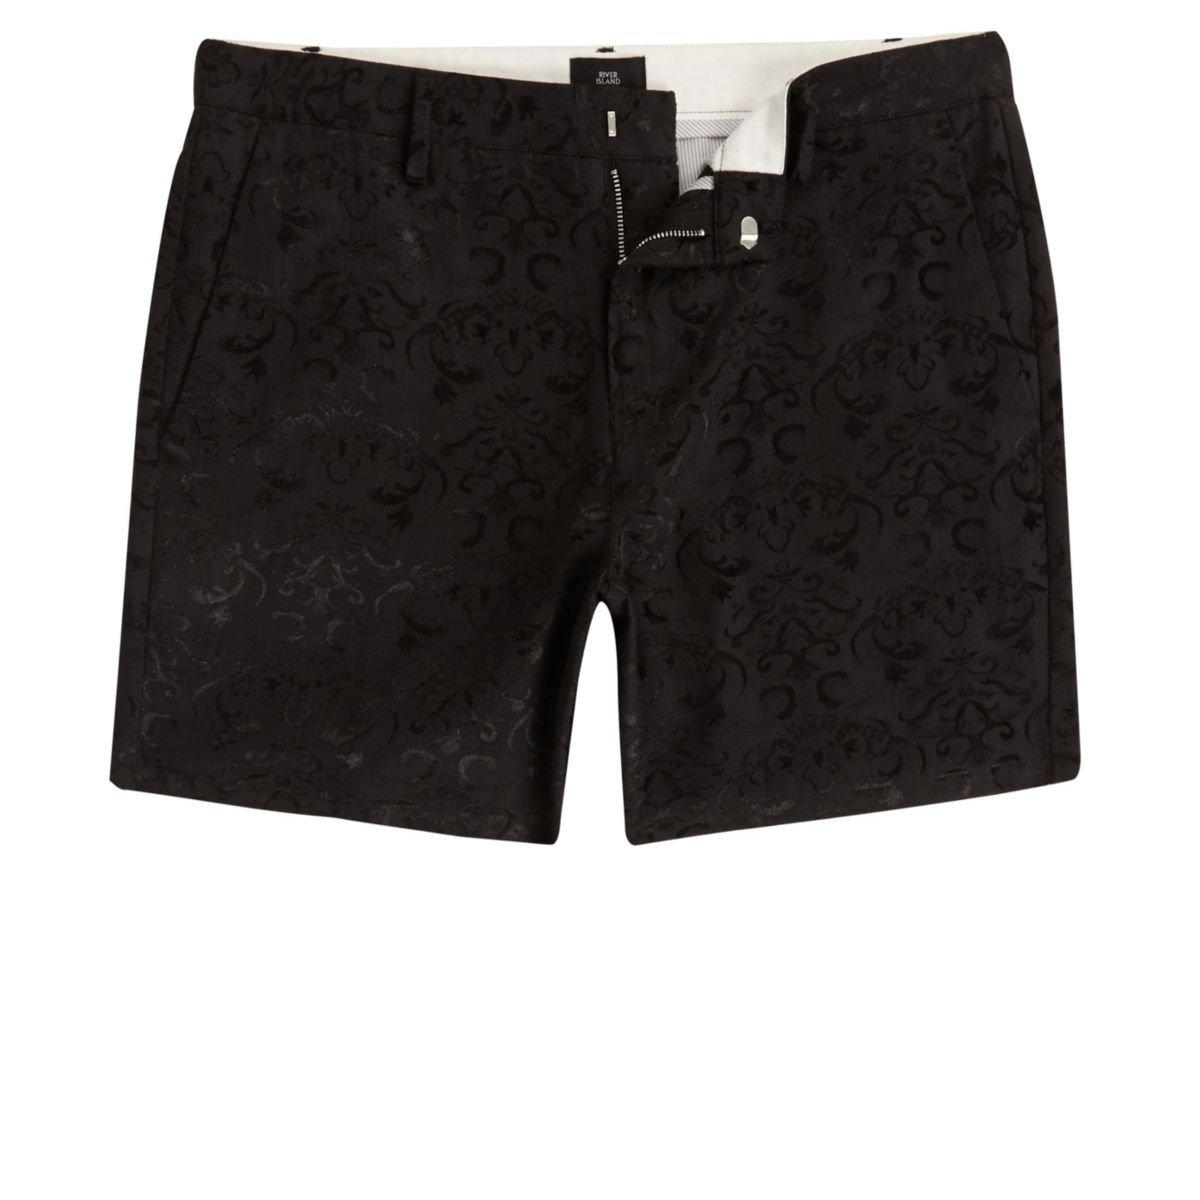 Schwarze Slim Fit Chino-Shorts